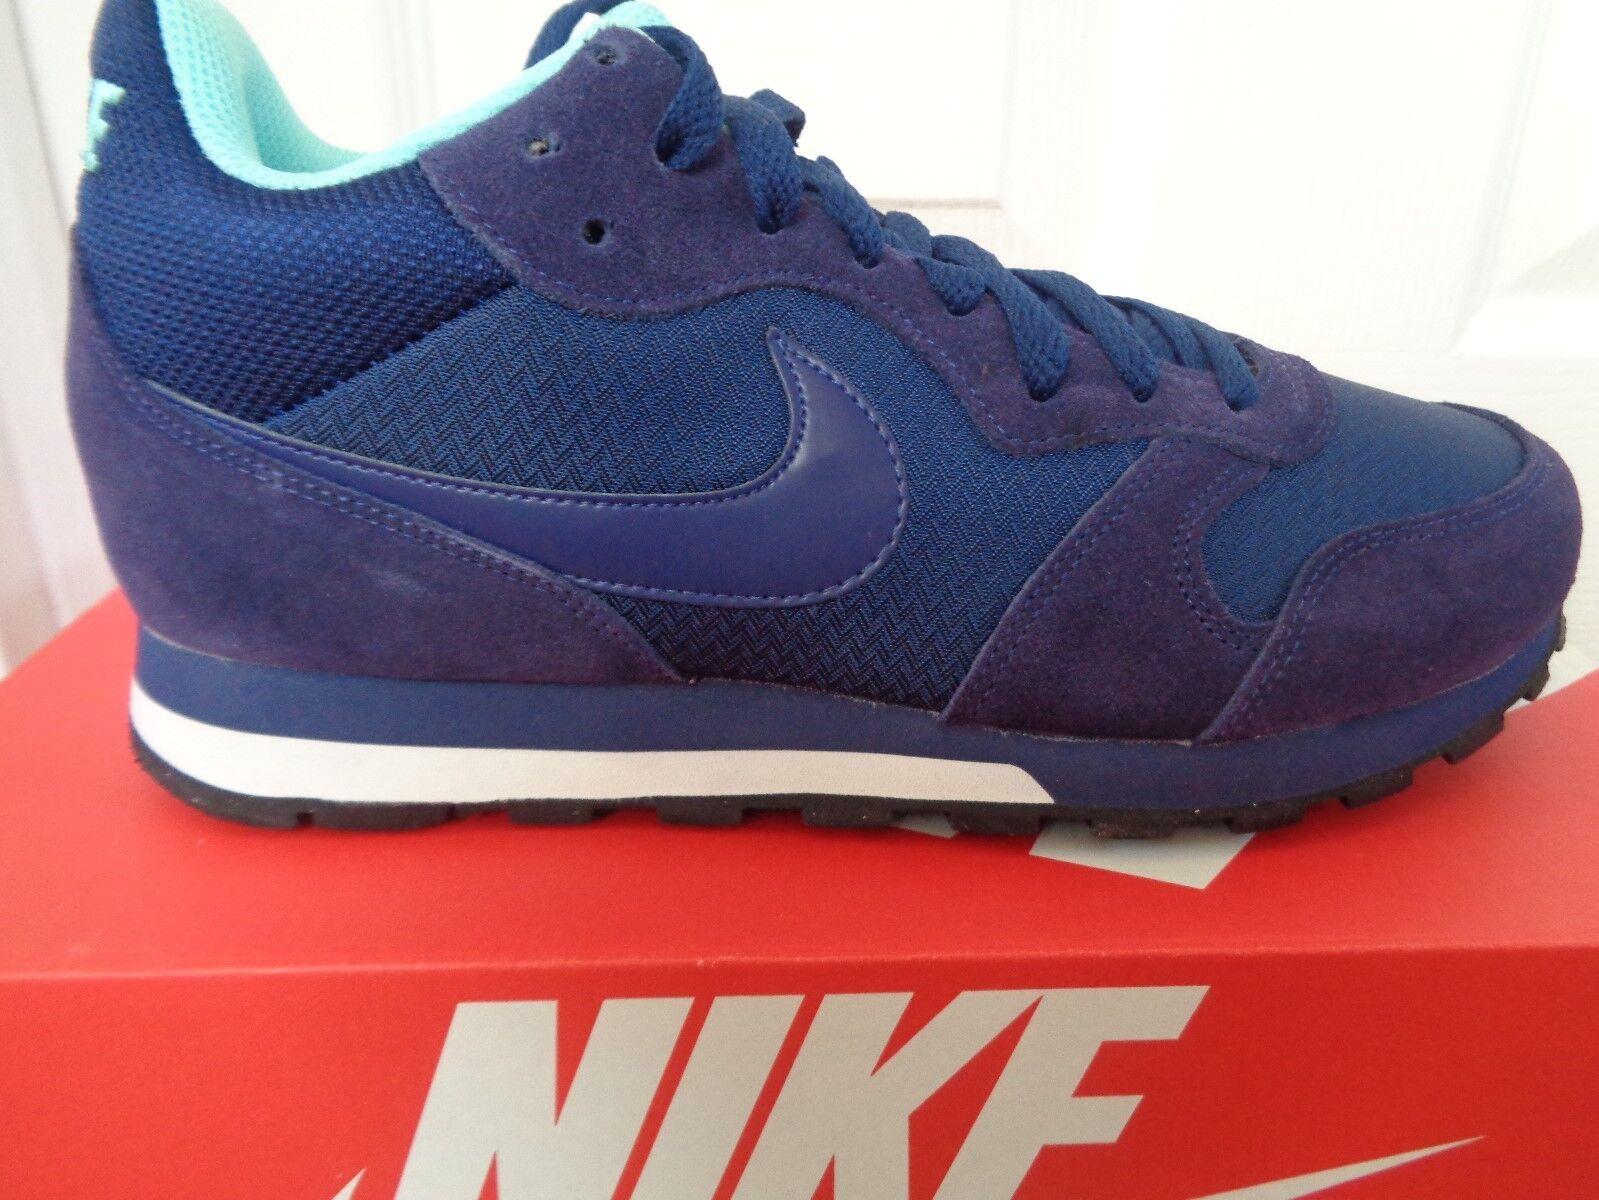 Nike MD Runner 2 Mid Tenis Zapatillas para mujer 807172 443 nos 9 Nuevo